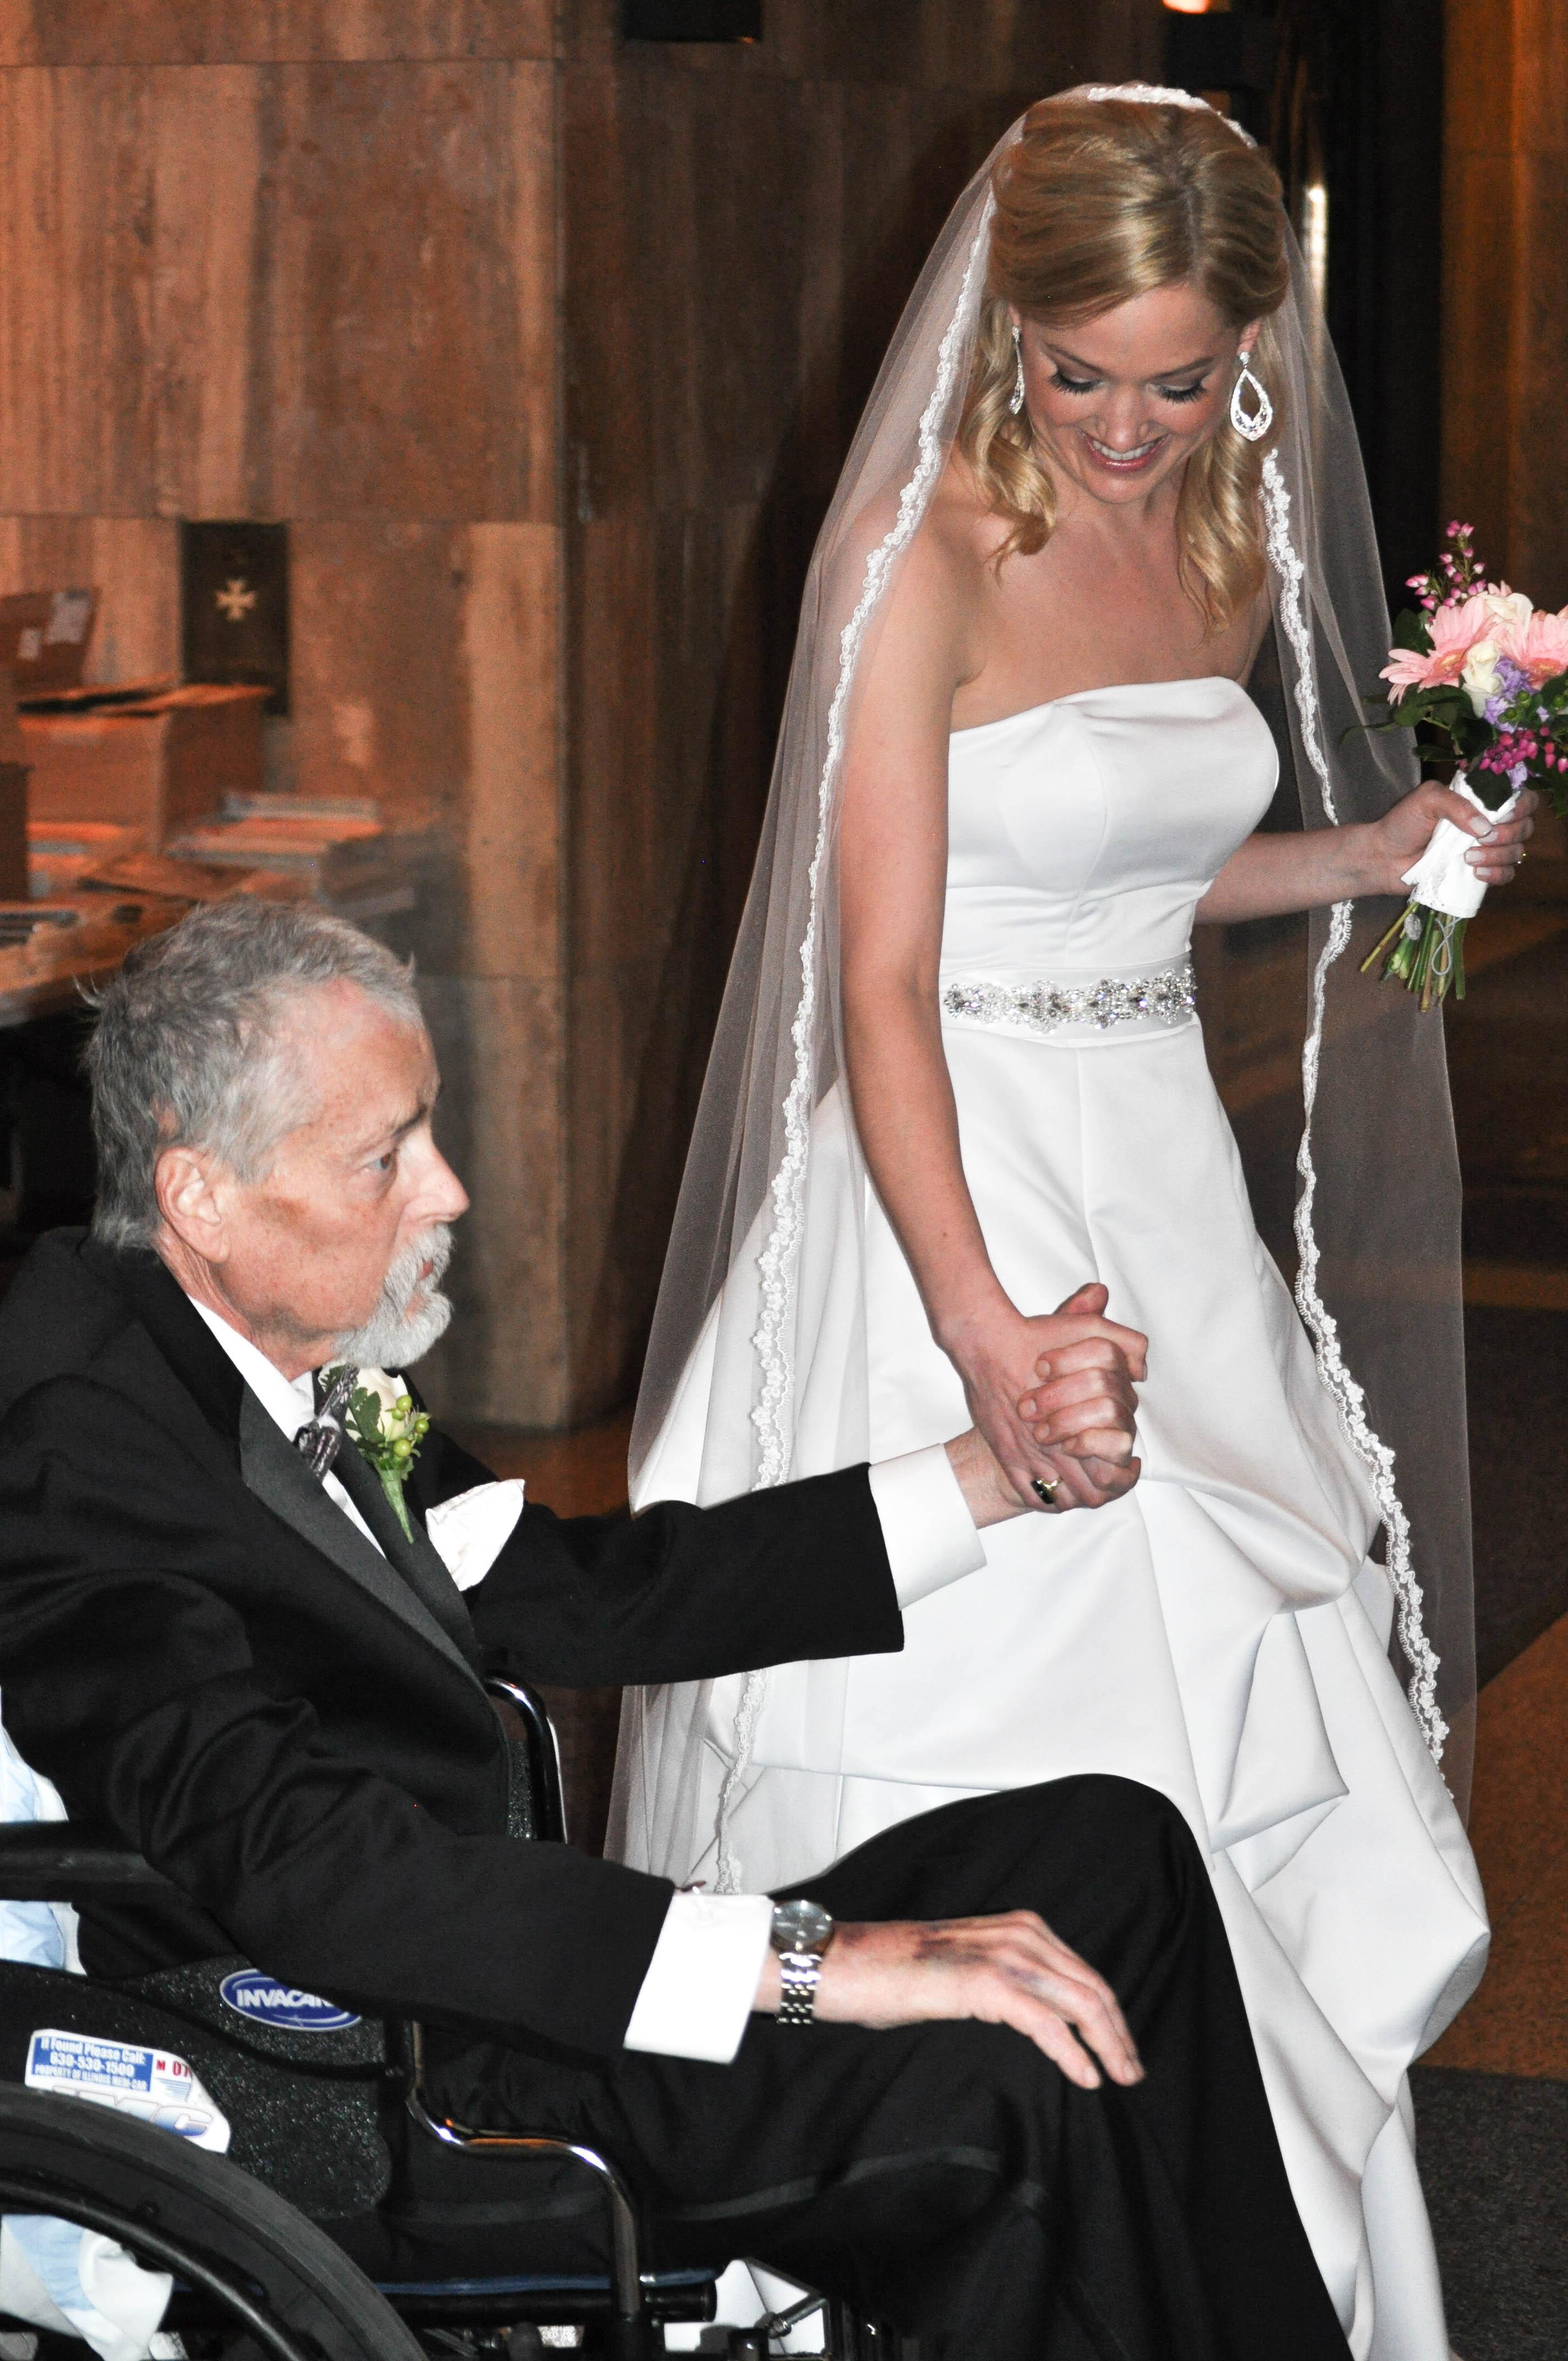 Designing the perfect wedding